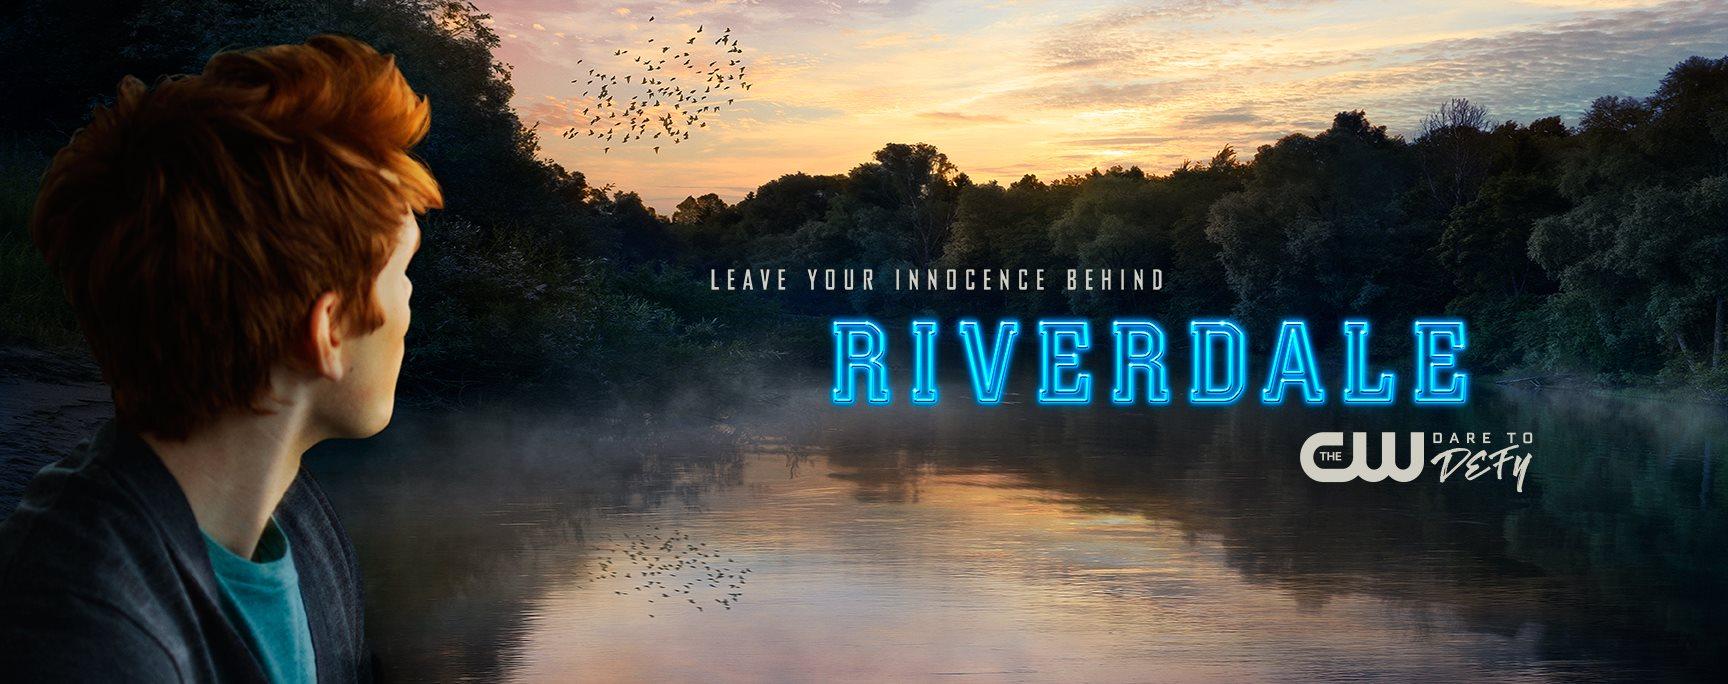 'Riverdale' Poster